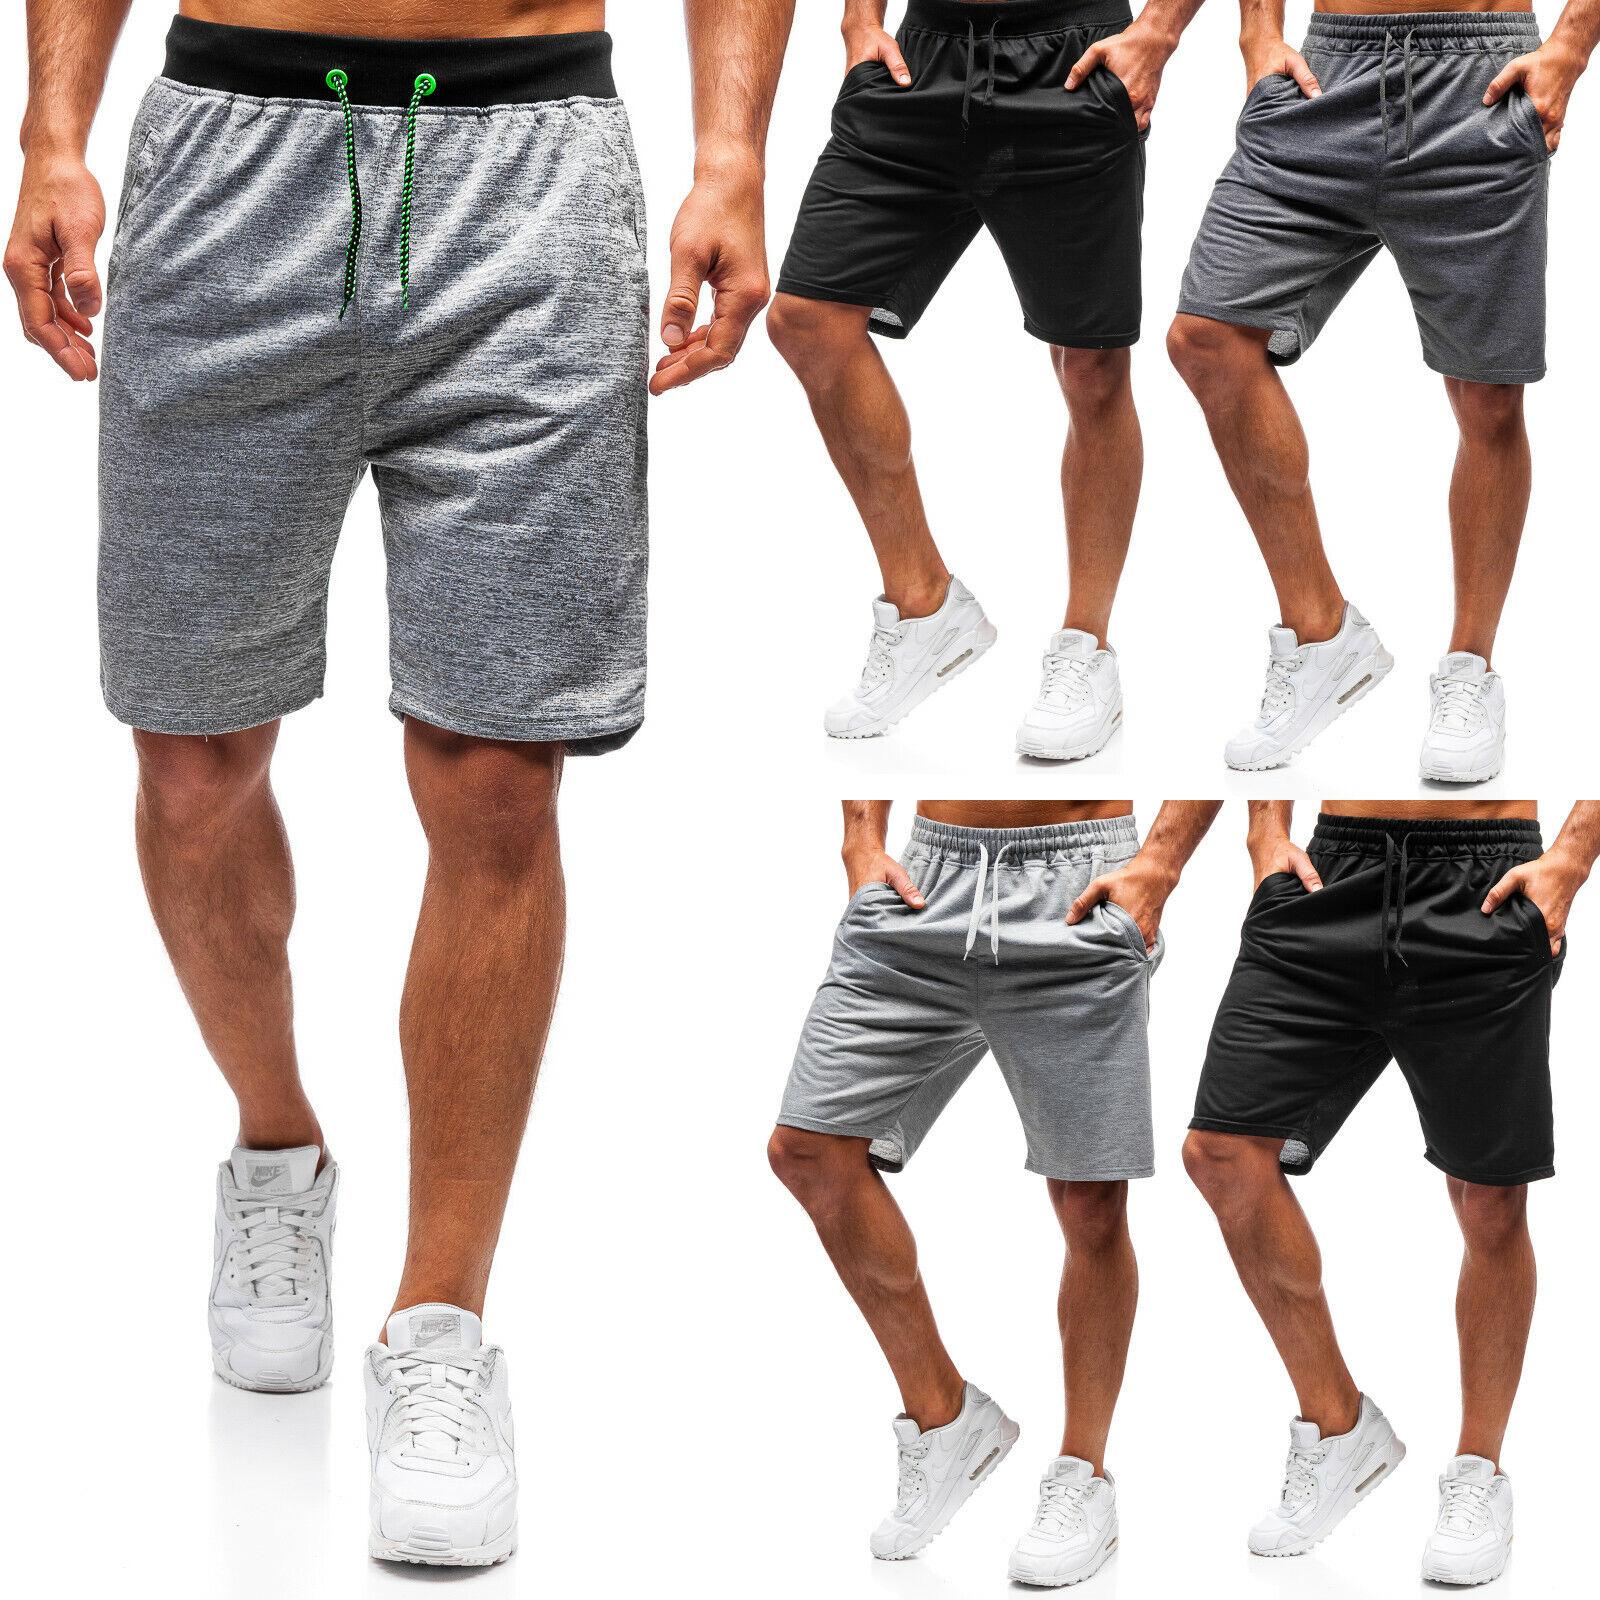 Shorts Bermudas Kurzhose Sporthose Jogging Sport Herren Mix BOLF 7G7 Unifarben